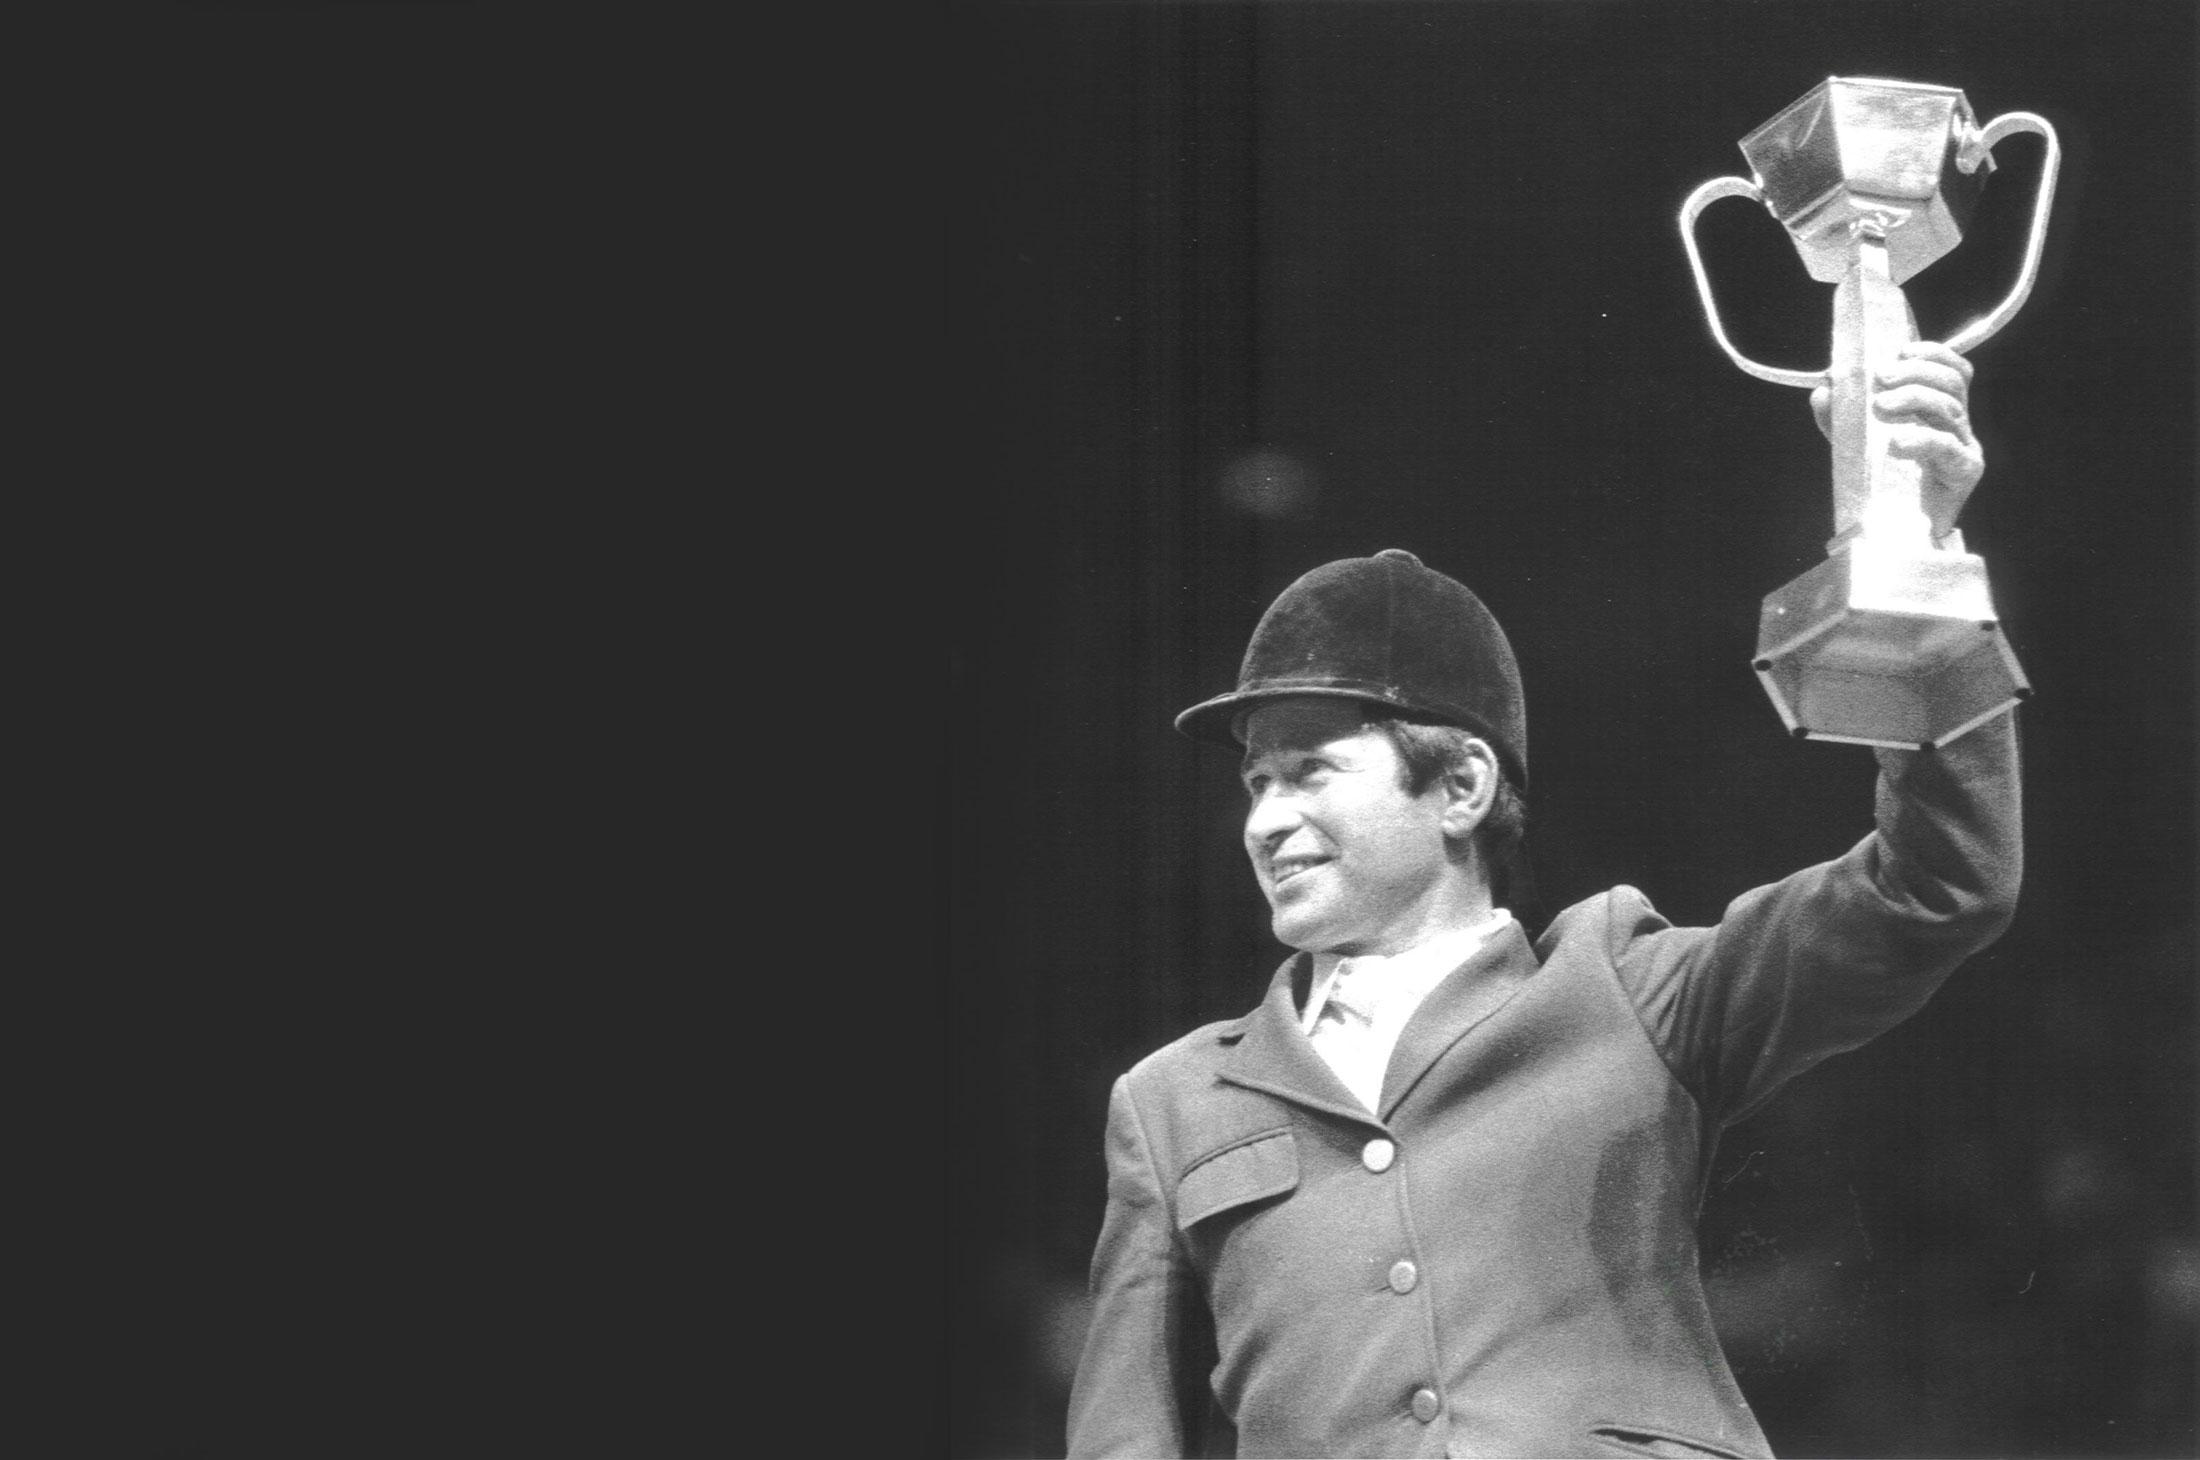 Hugo Simon wins the inaugural World Cup Final in 1979